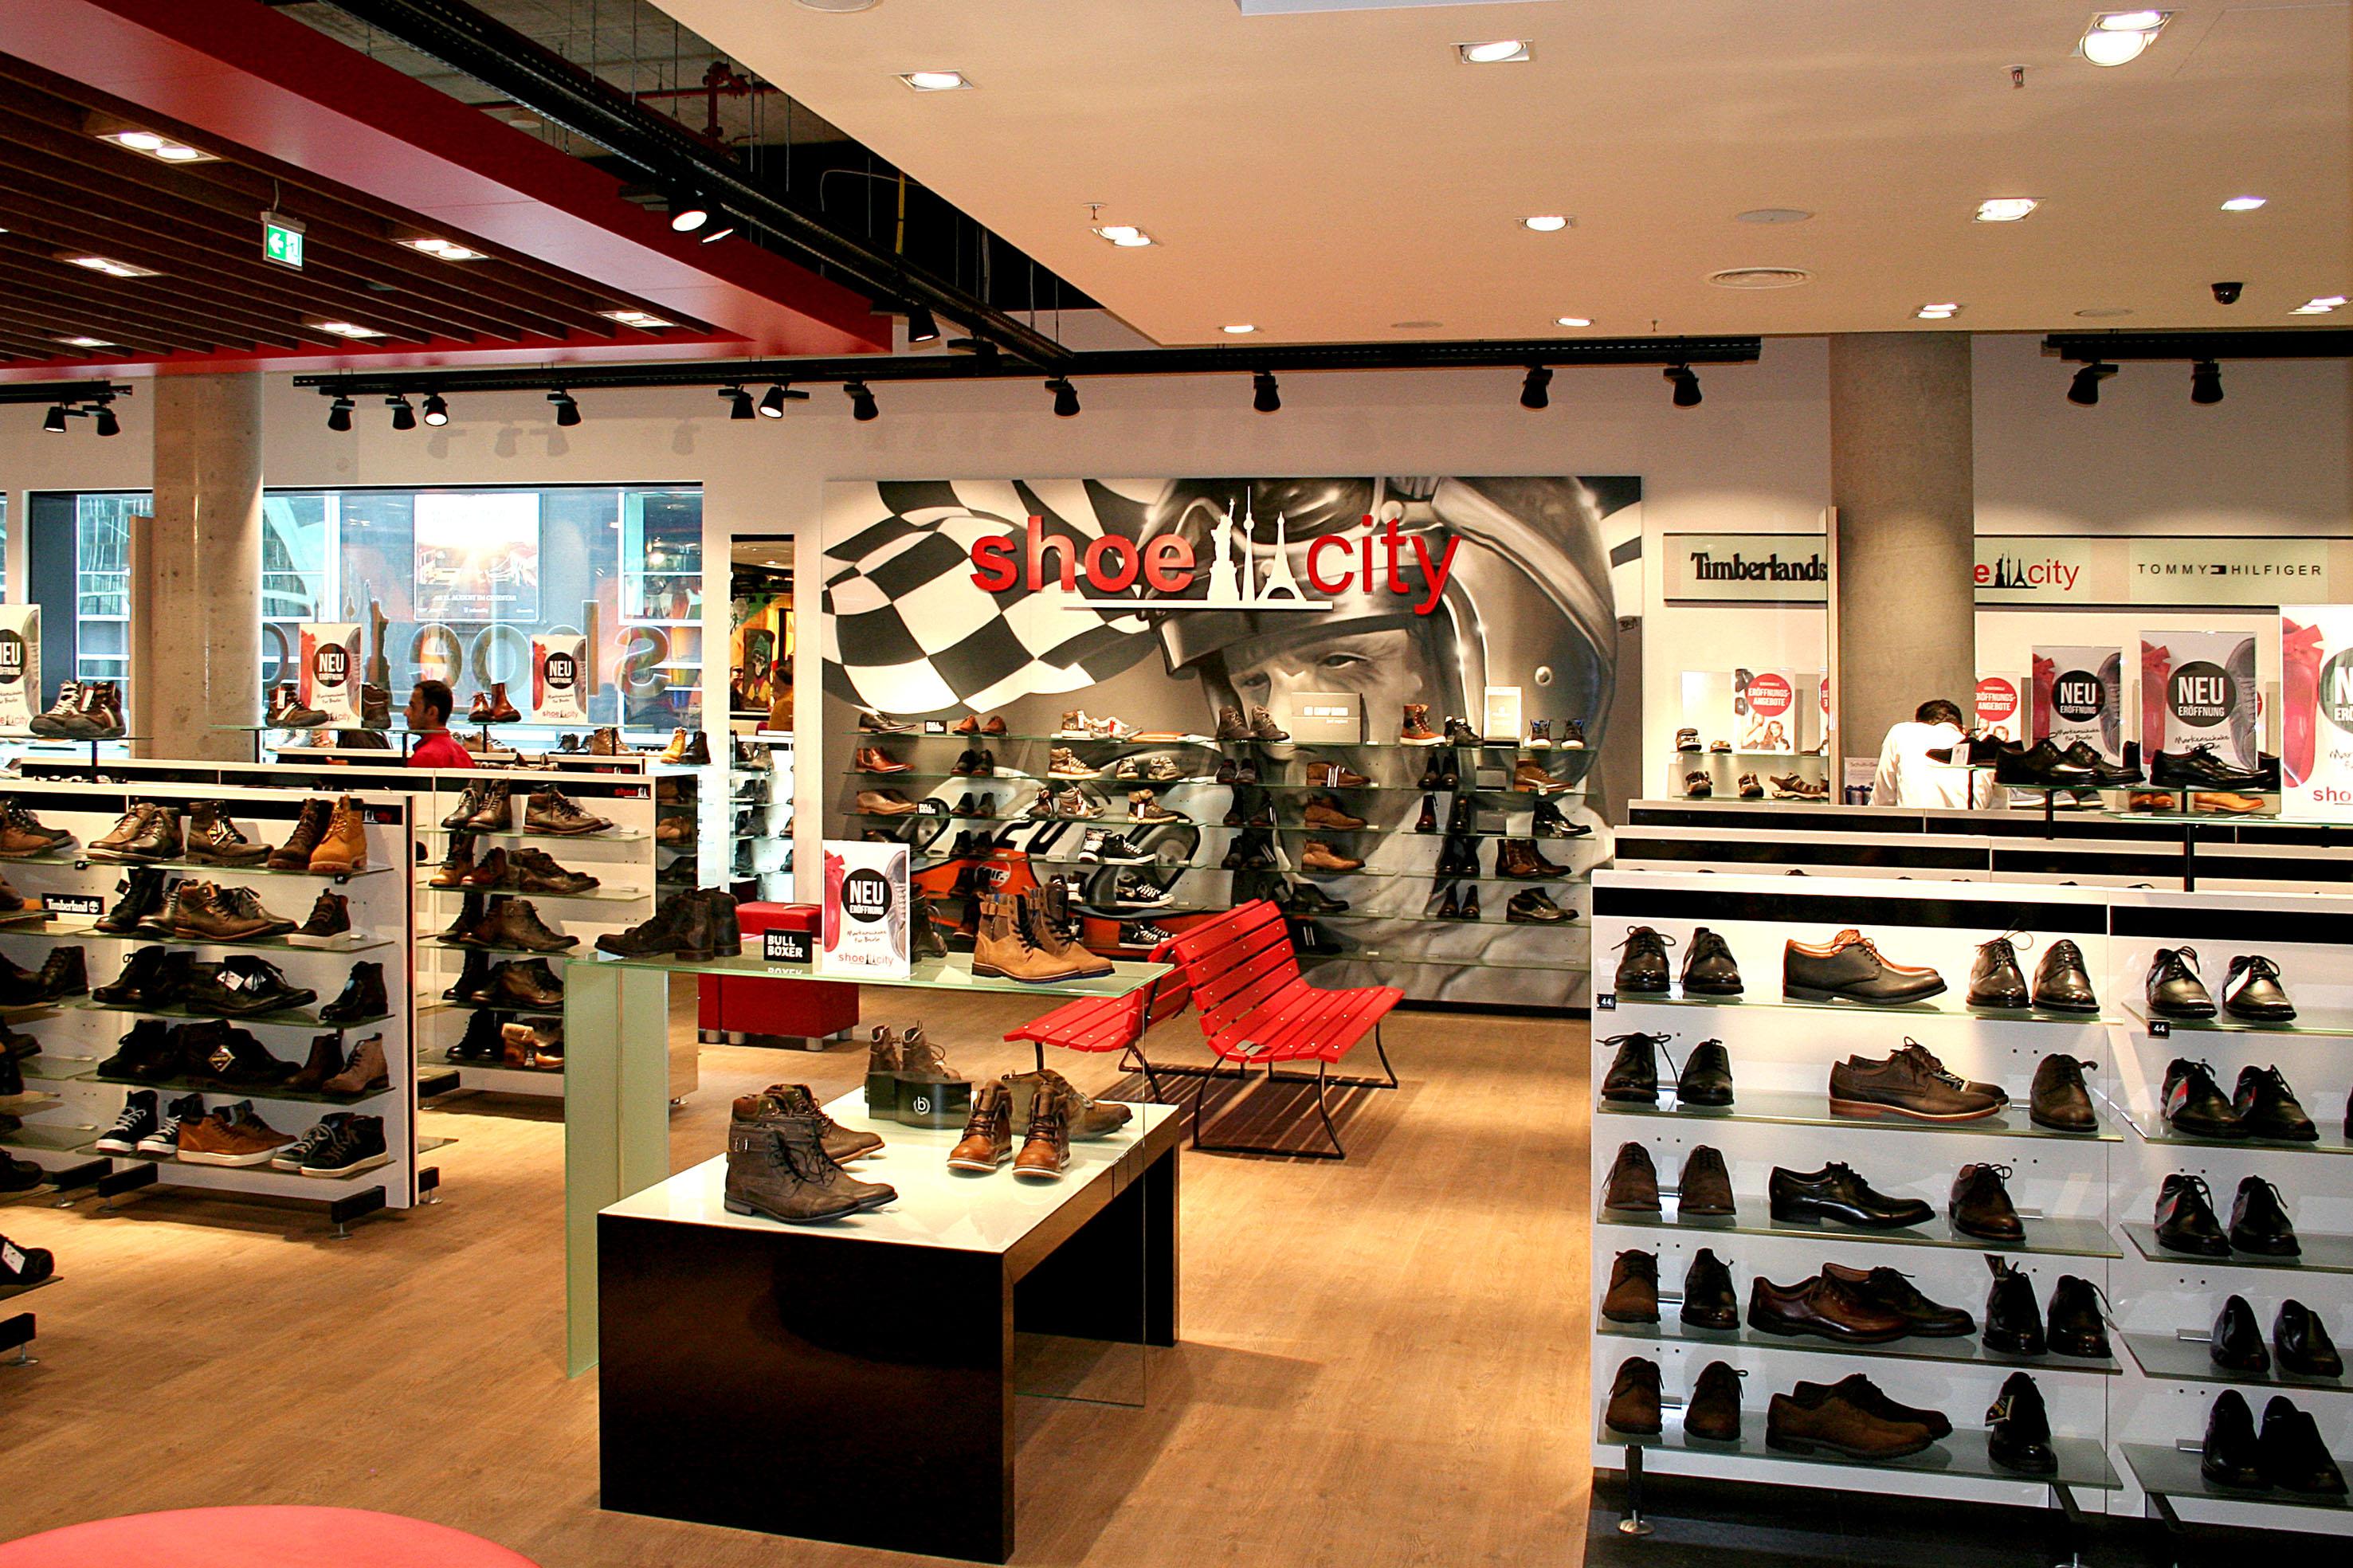 Shoe City Alexanderplatz Shoes (Retail) in Berlin (address